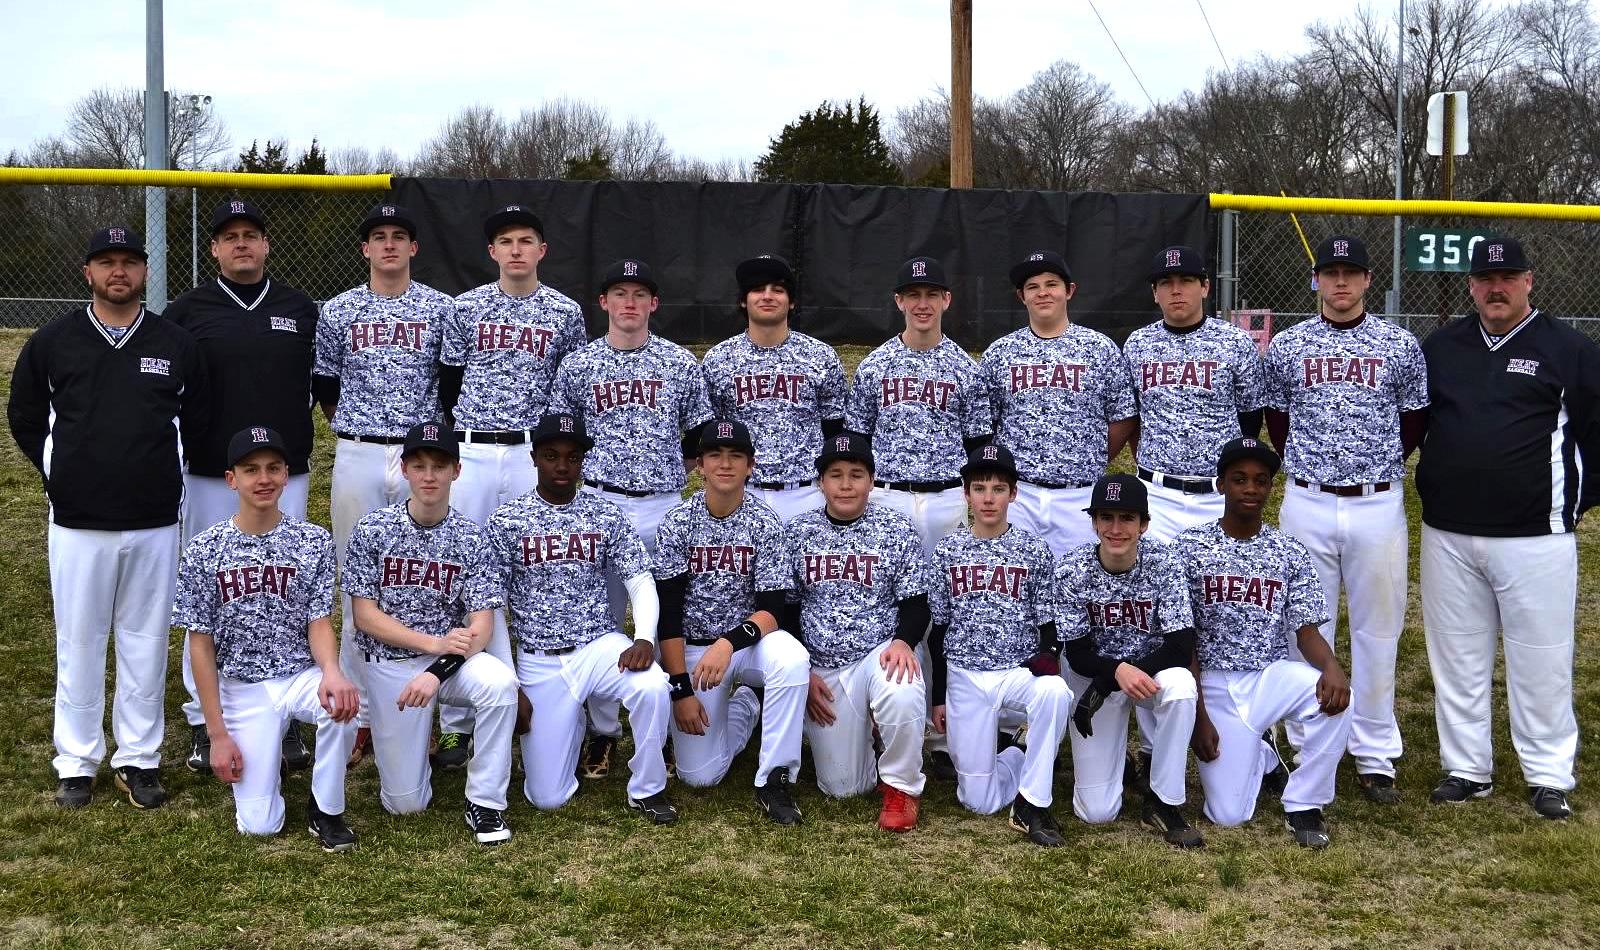 2015 High School Boys Baseball